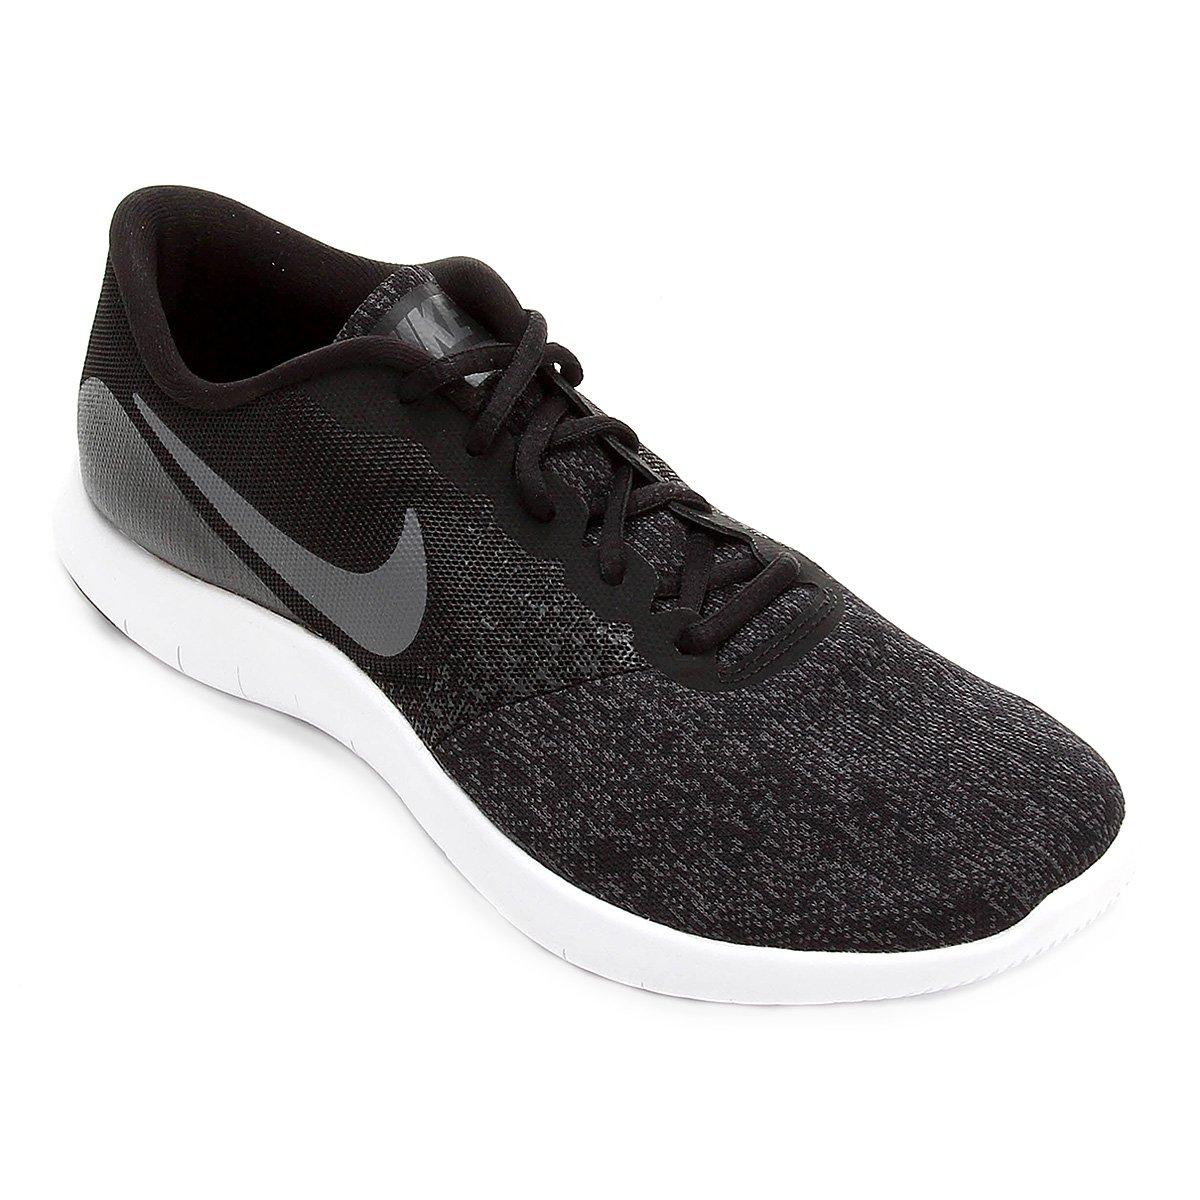 423bbc6ae22 Tênis Nike Flex Contact Masculino - Preto e Cinza - Compre Agora ...